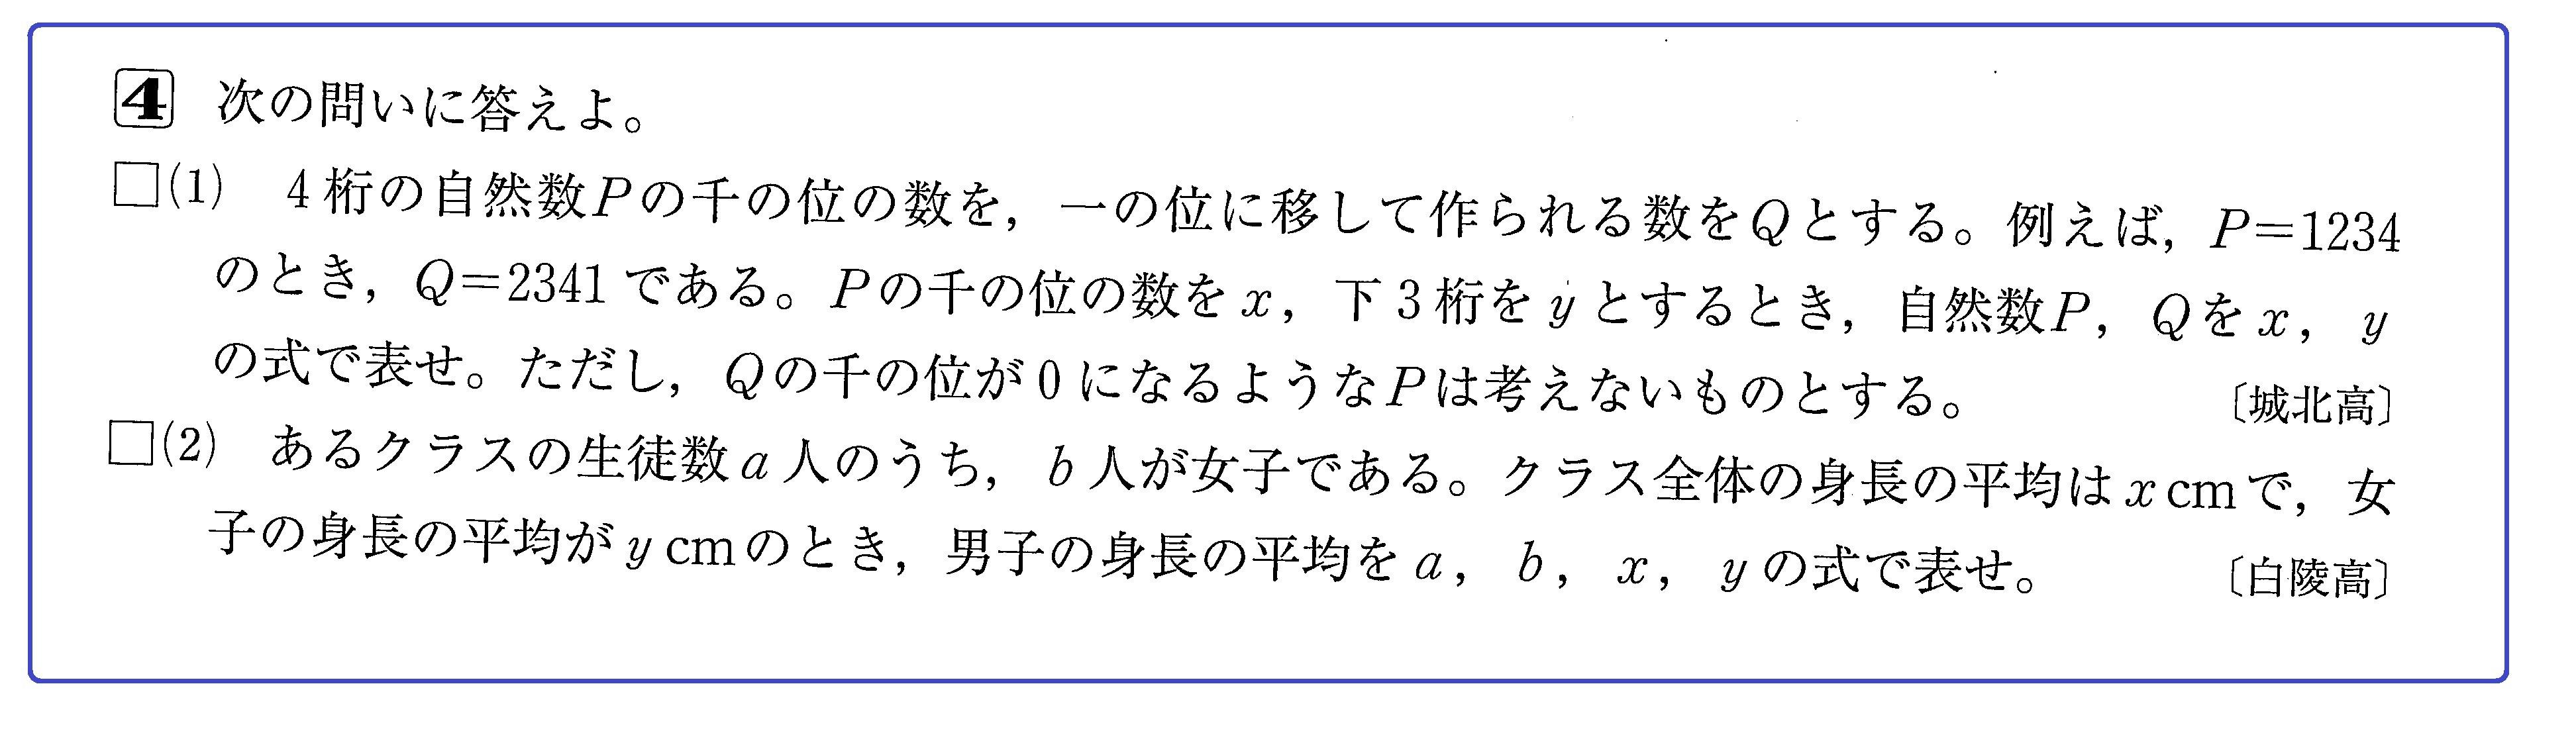 文字と式 jpeg.jpg